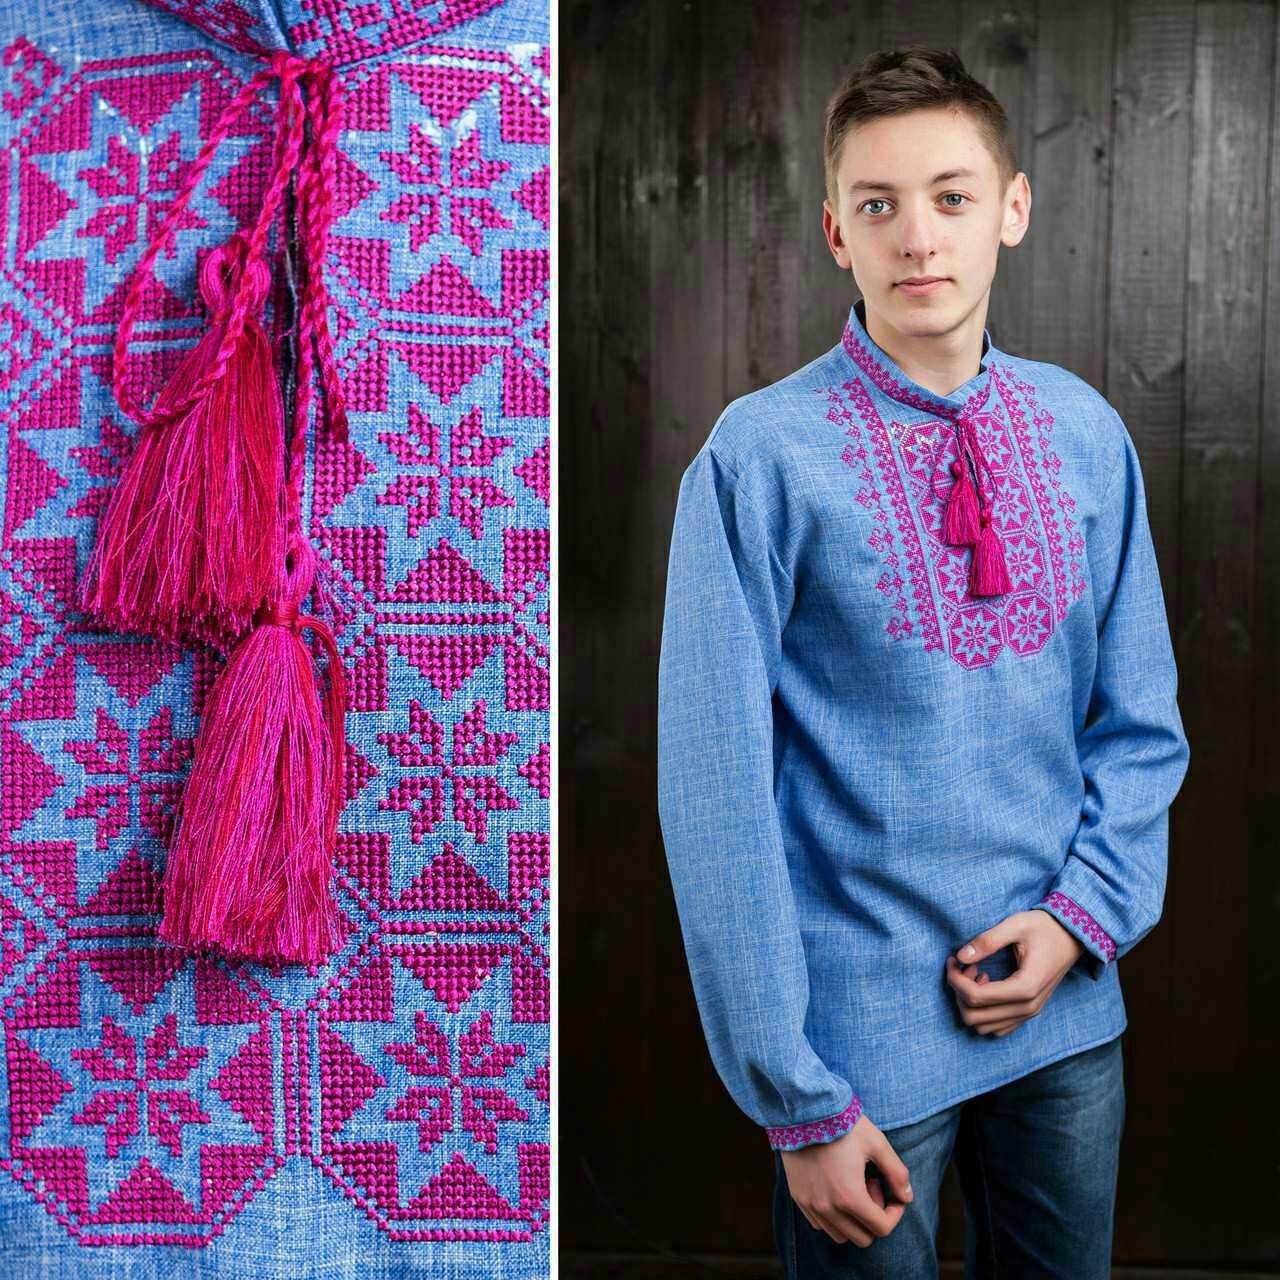 Вышитая рубаха для мужчин с длинным рукавой,  габардин, 350/300 (цена за 1 шт. + 50 гр.)